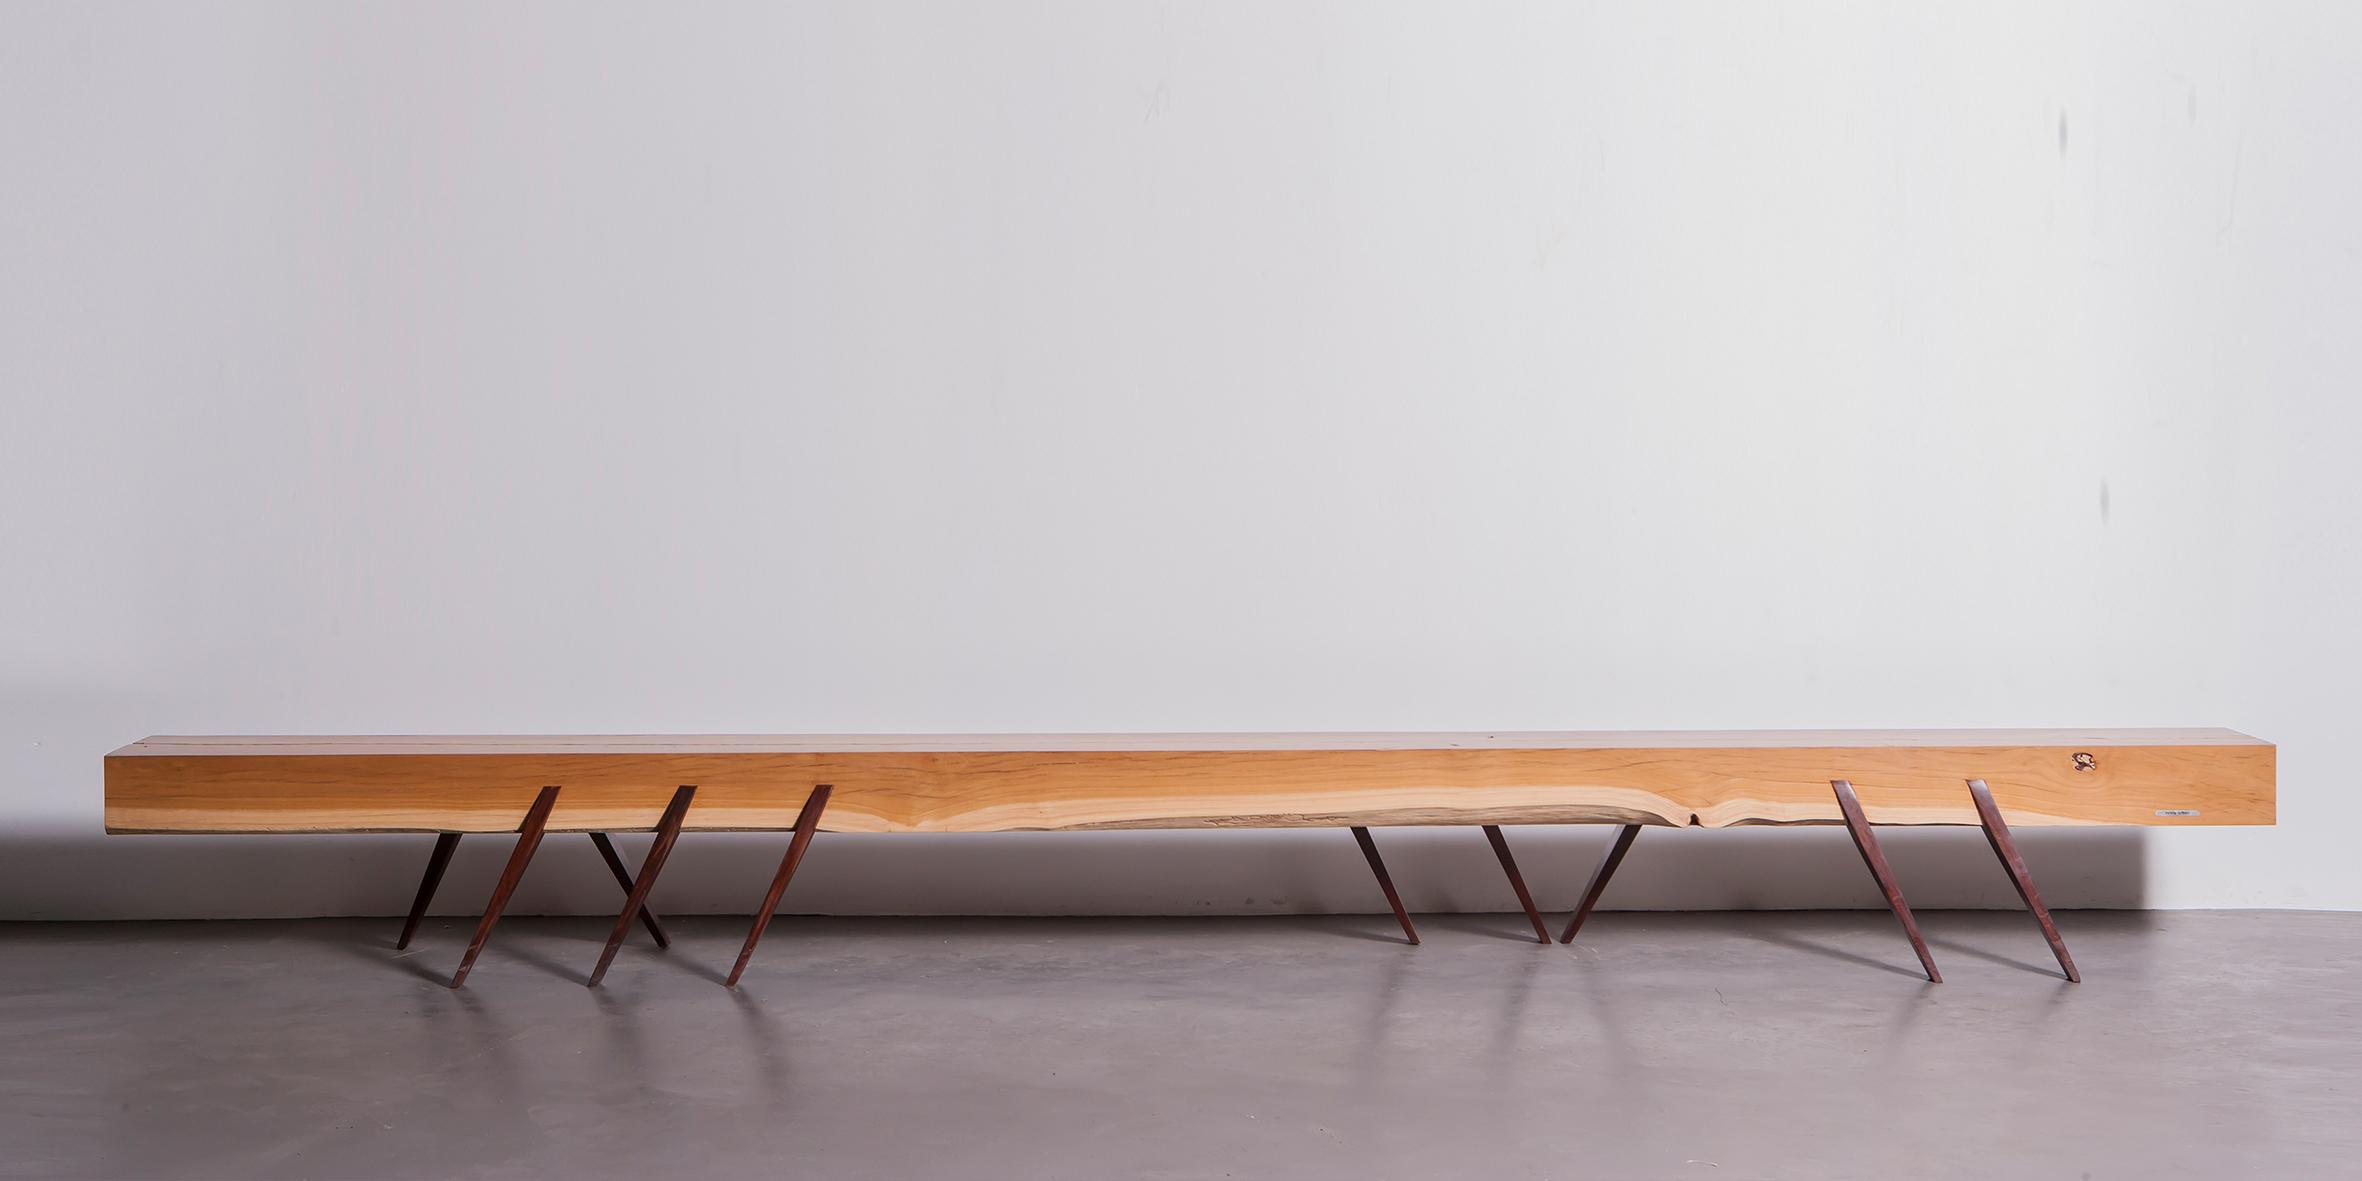 goggo bench, 4000 l x 290 w x 430 h, gum with jarrah legs